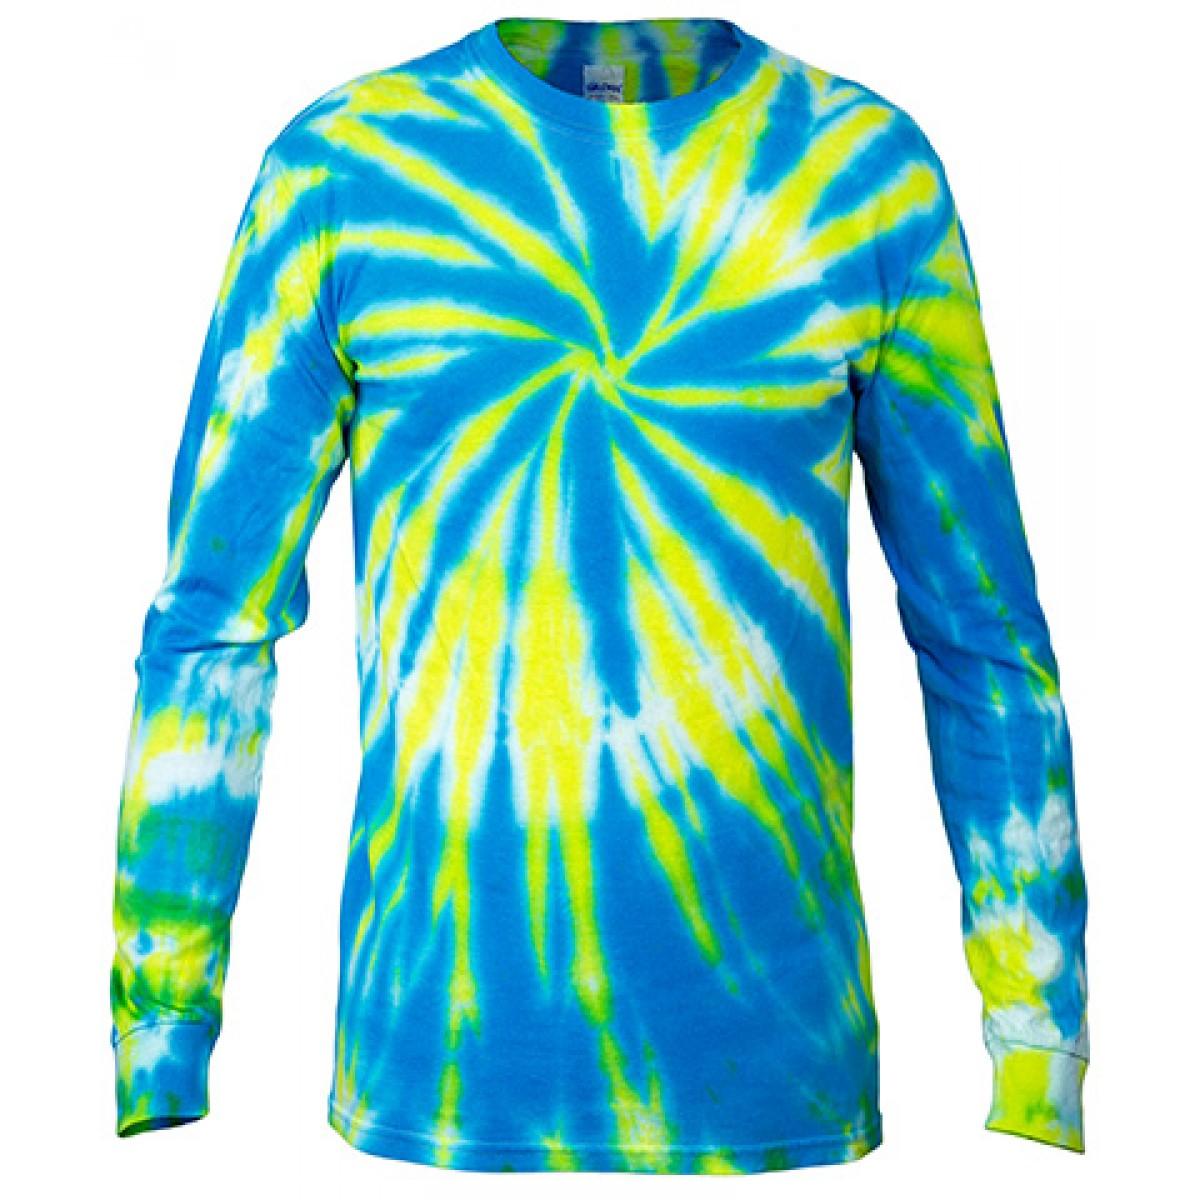 Multi Color Tie Dye Long Sleeve Shirt